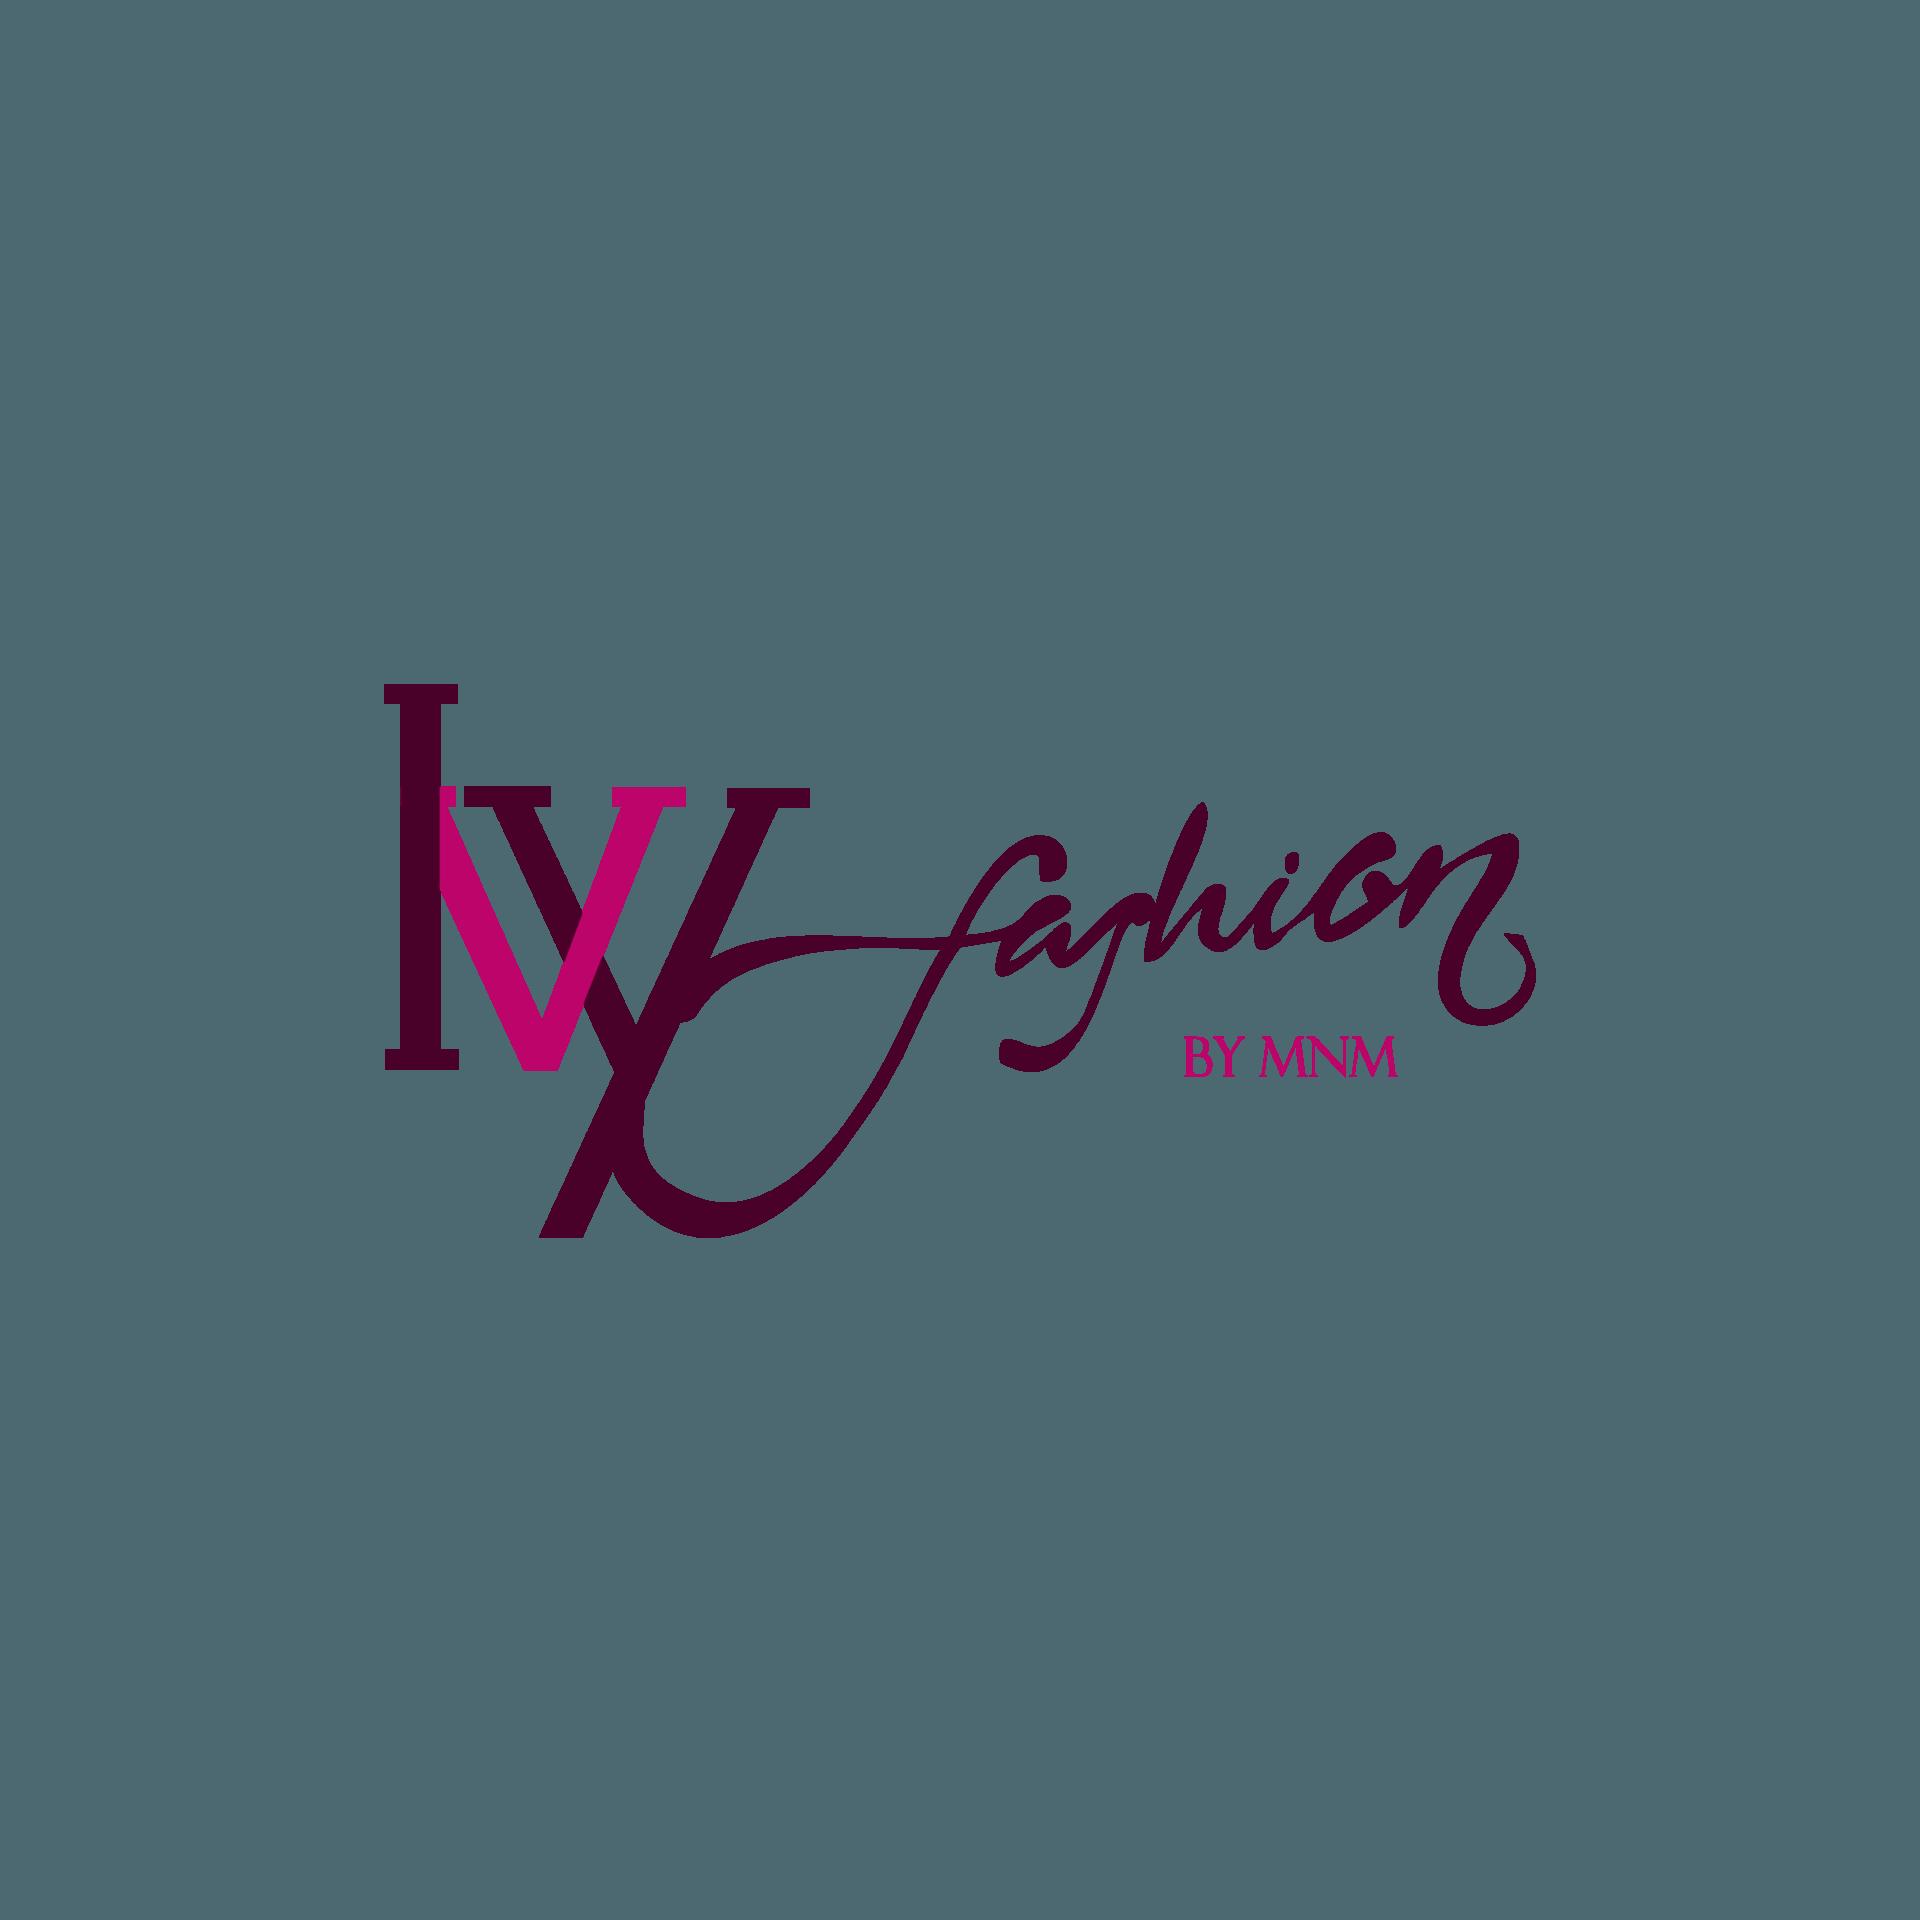 ScrollMantra/IVY Logo